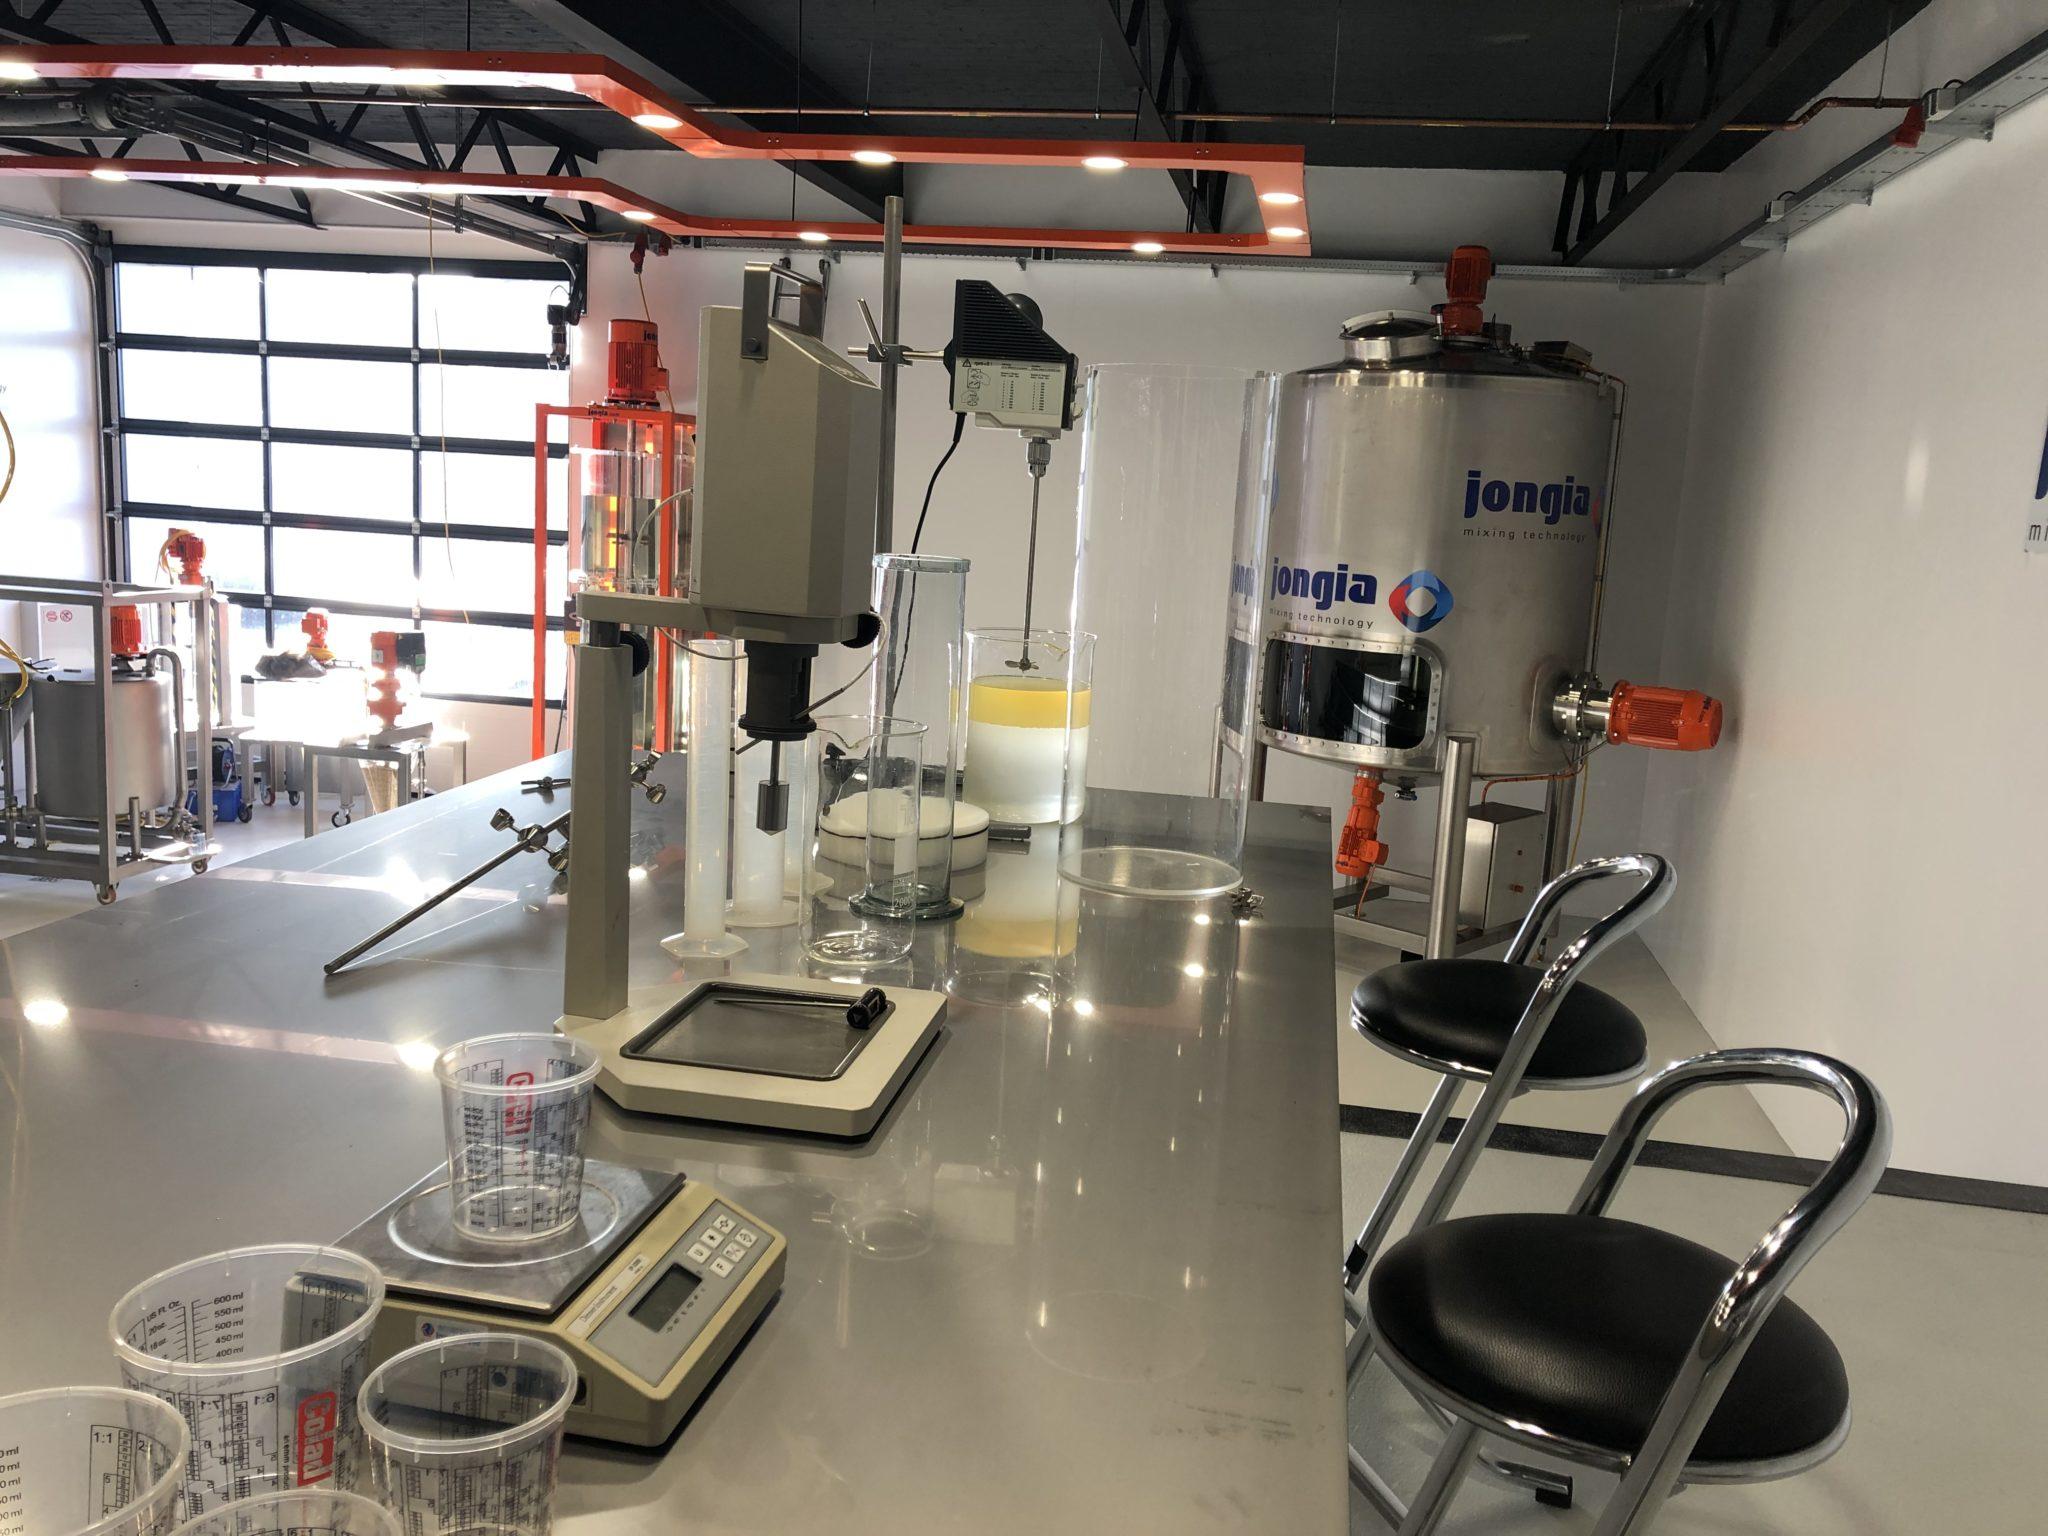 Jongia's hochmodernes Technologie Center